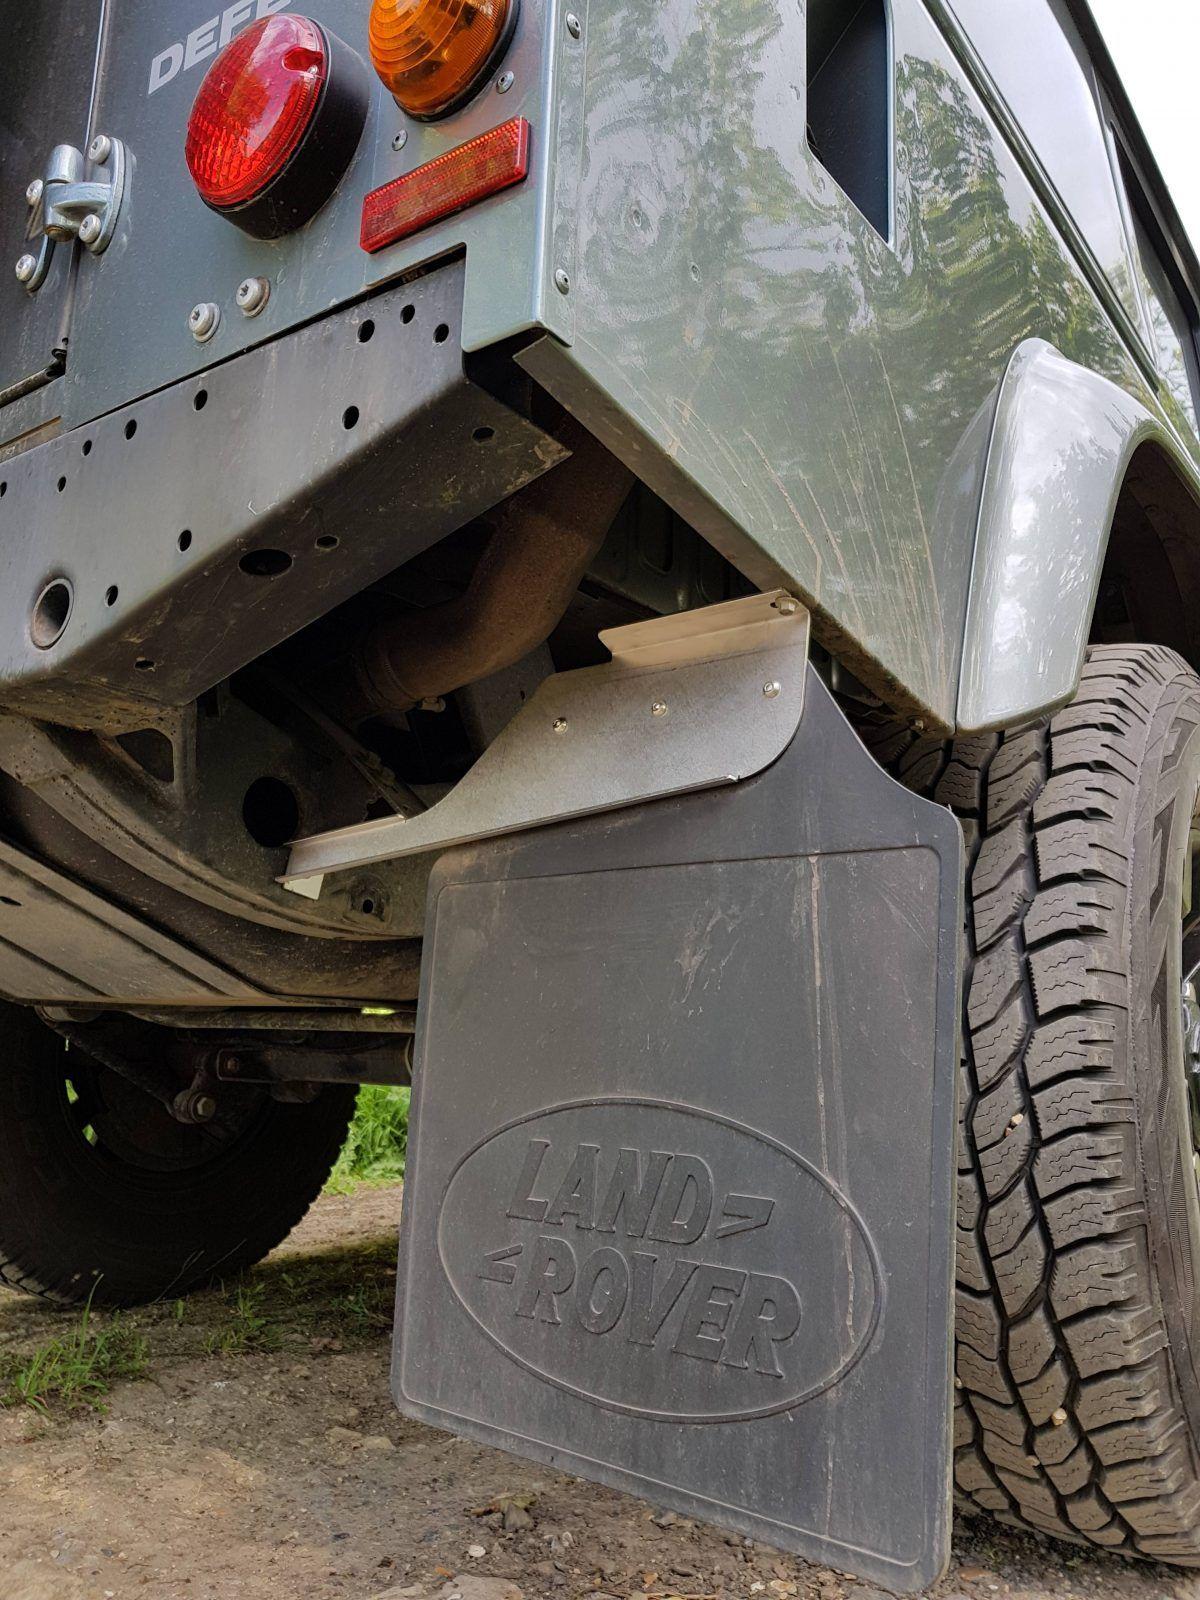 Far Defender 110 Stainless Steel Rear Mudflap Brackets